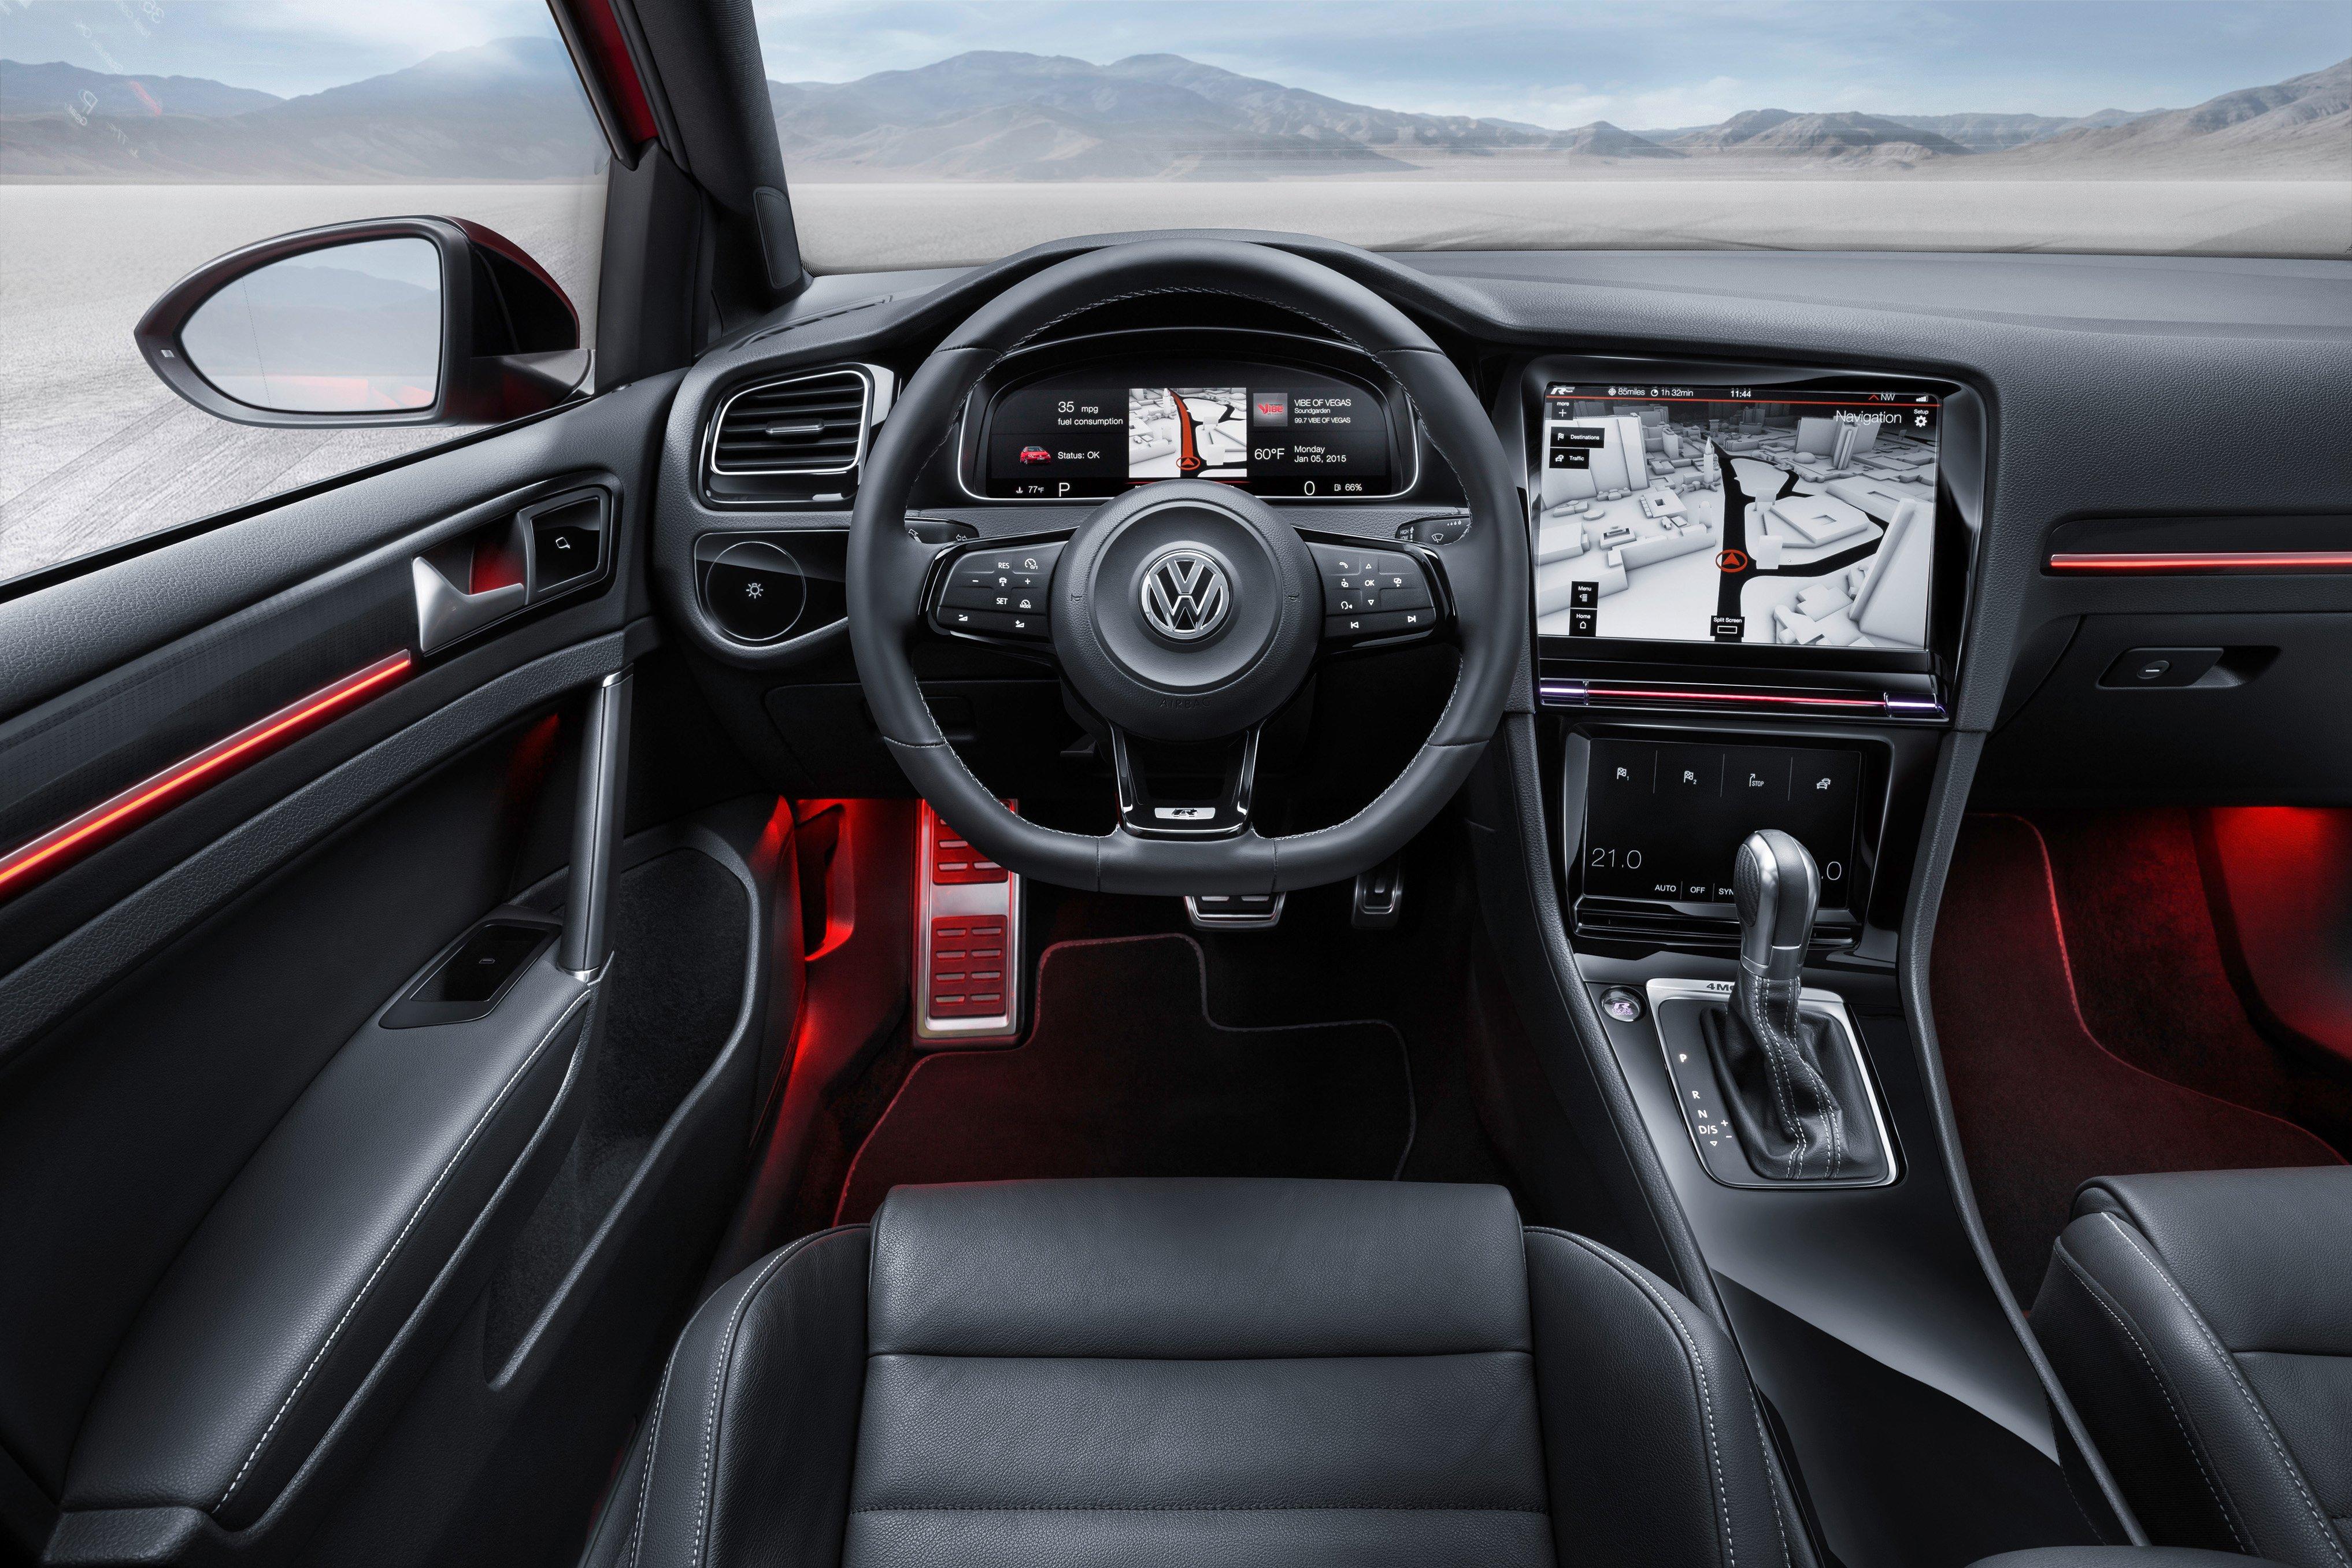 2016 VW Golf Mk7 facelift to feature gesture control | {Auto cockpit vw 8}